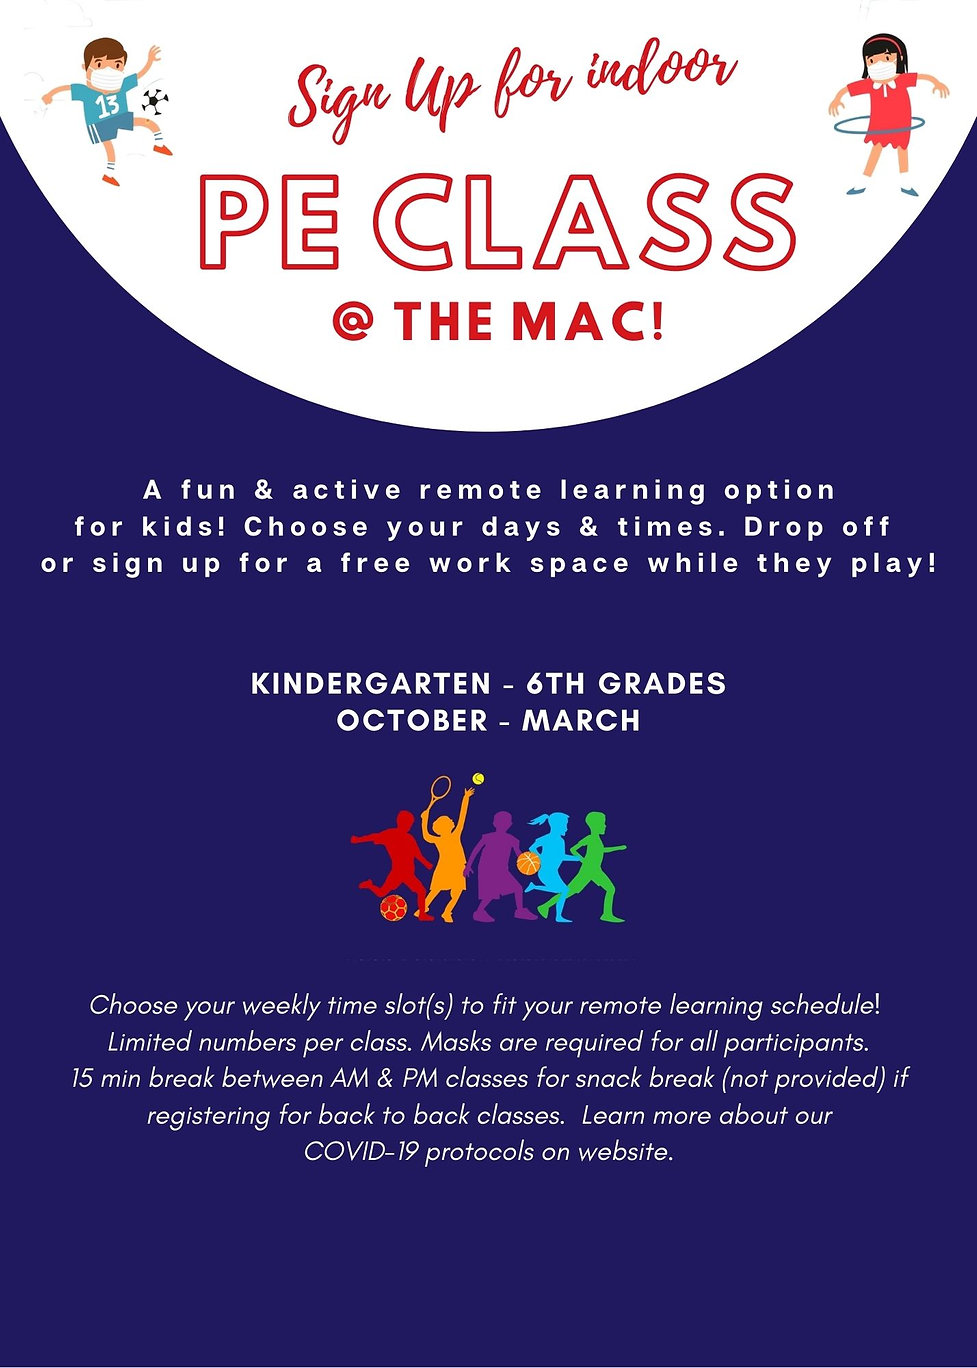 PE Class at the MAC Flyer.jpg